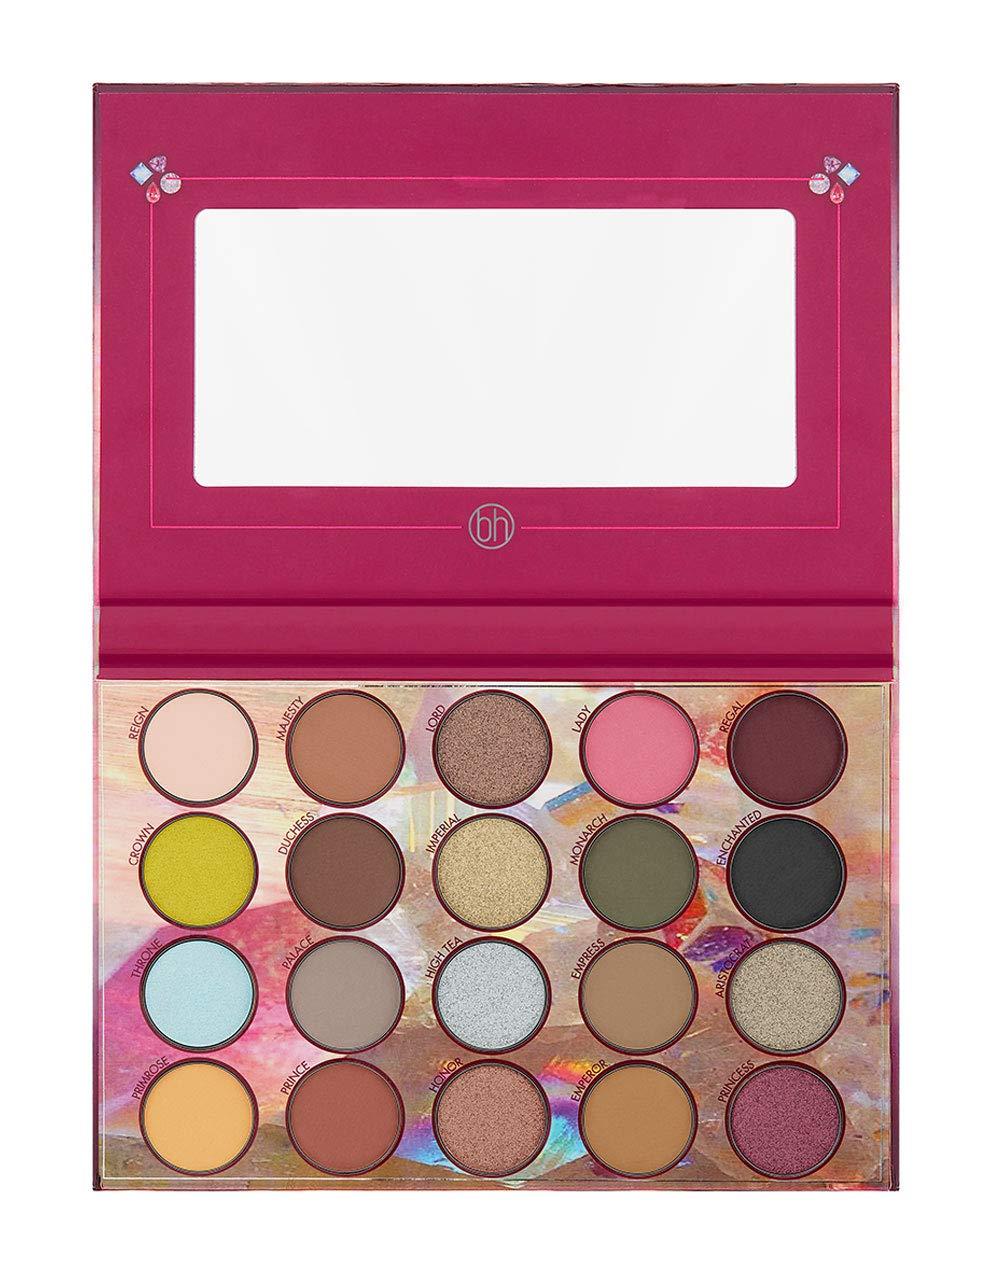 is bh cosmetics drugstore brand